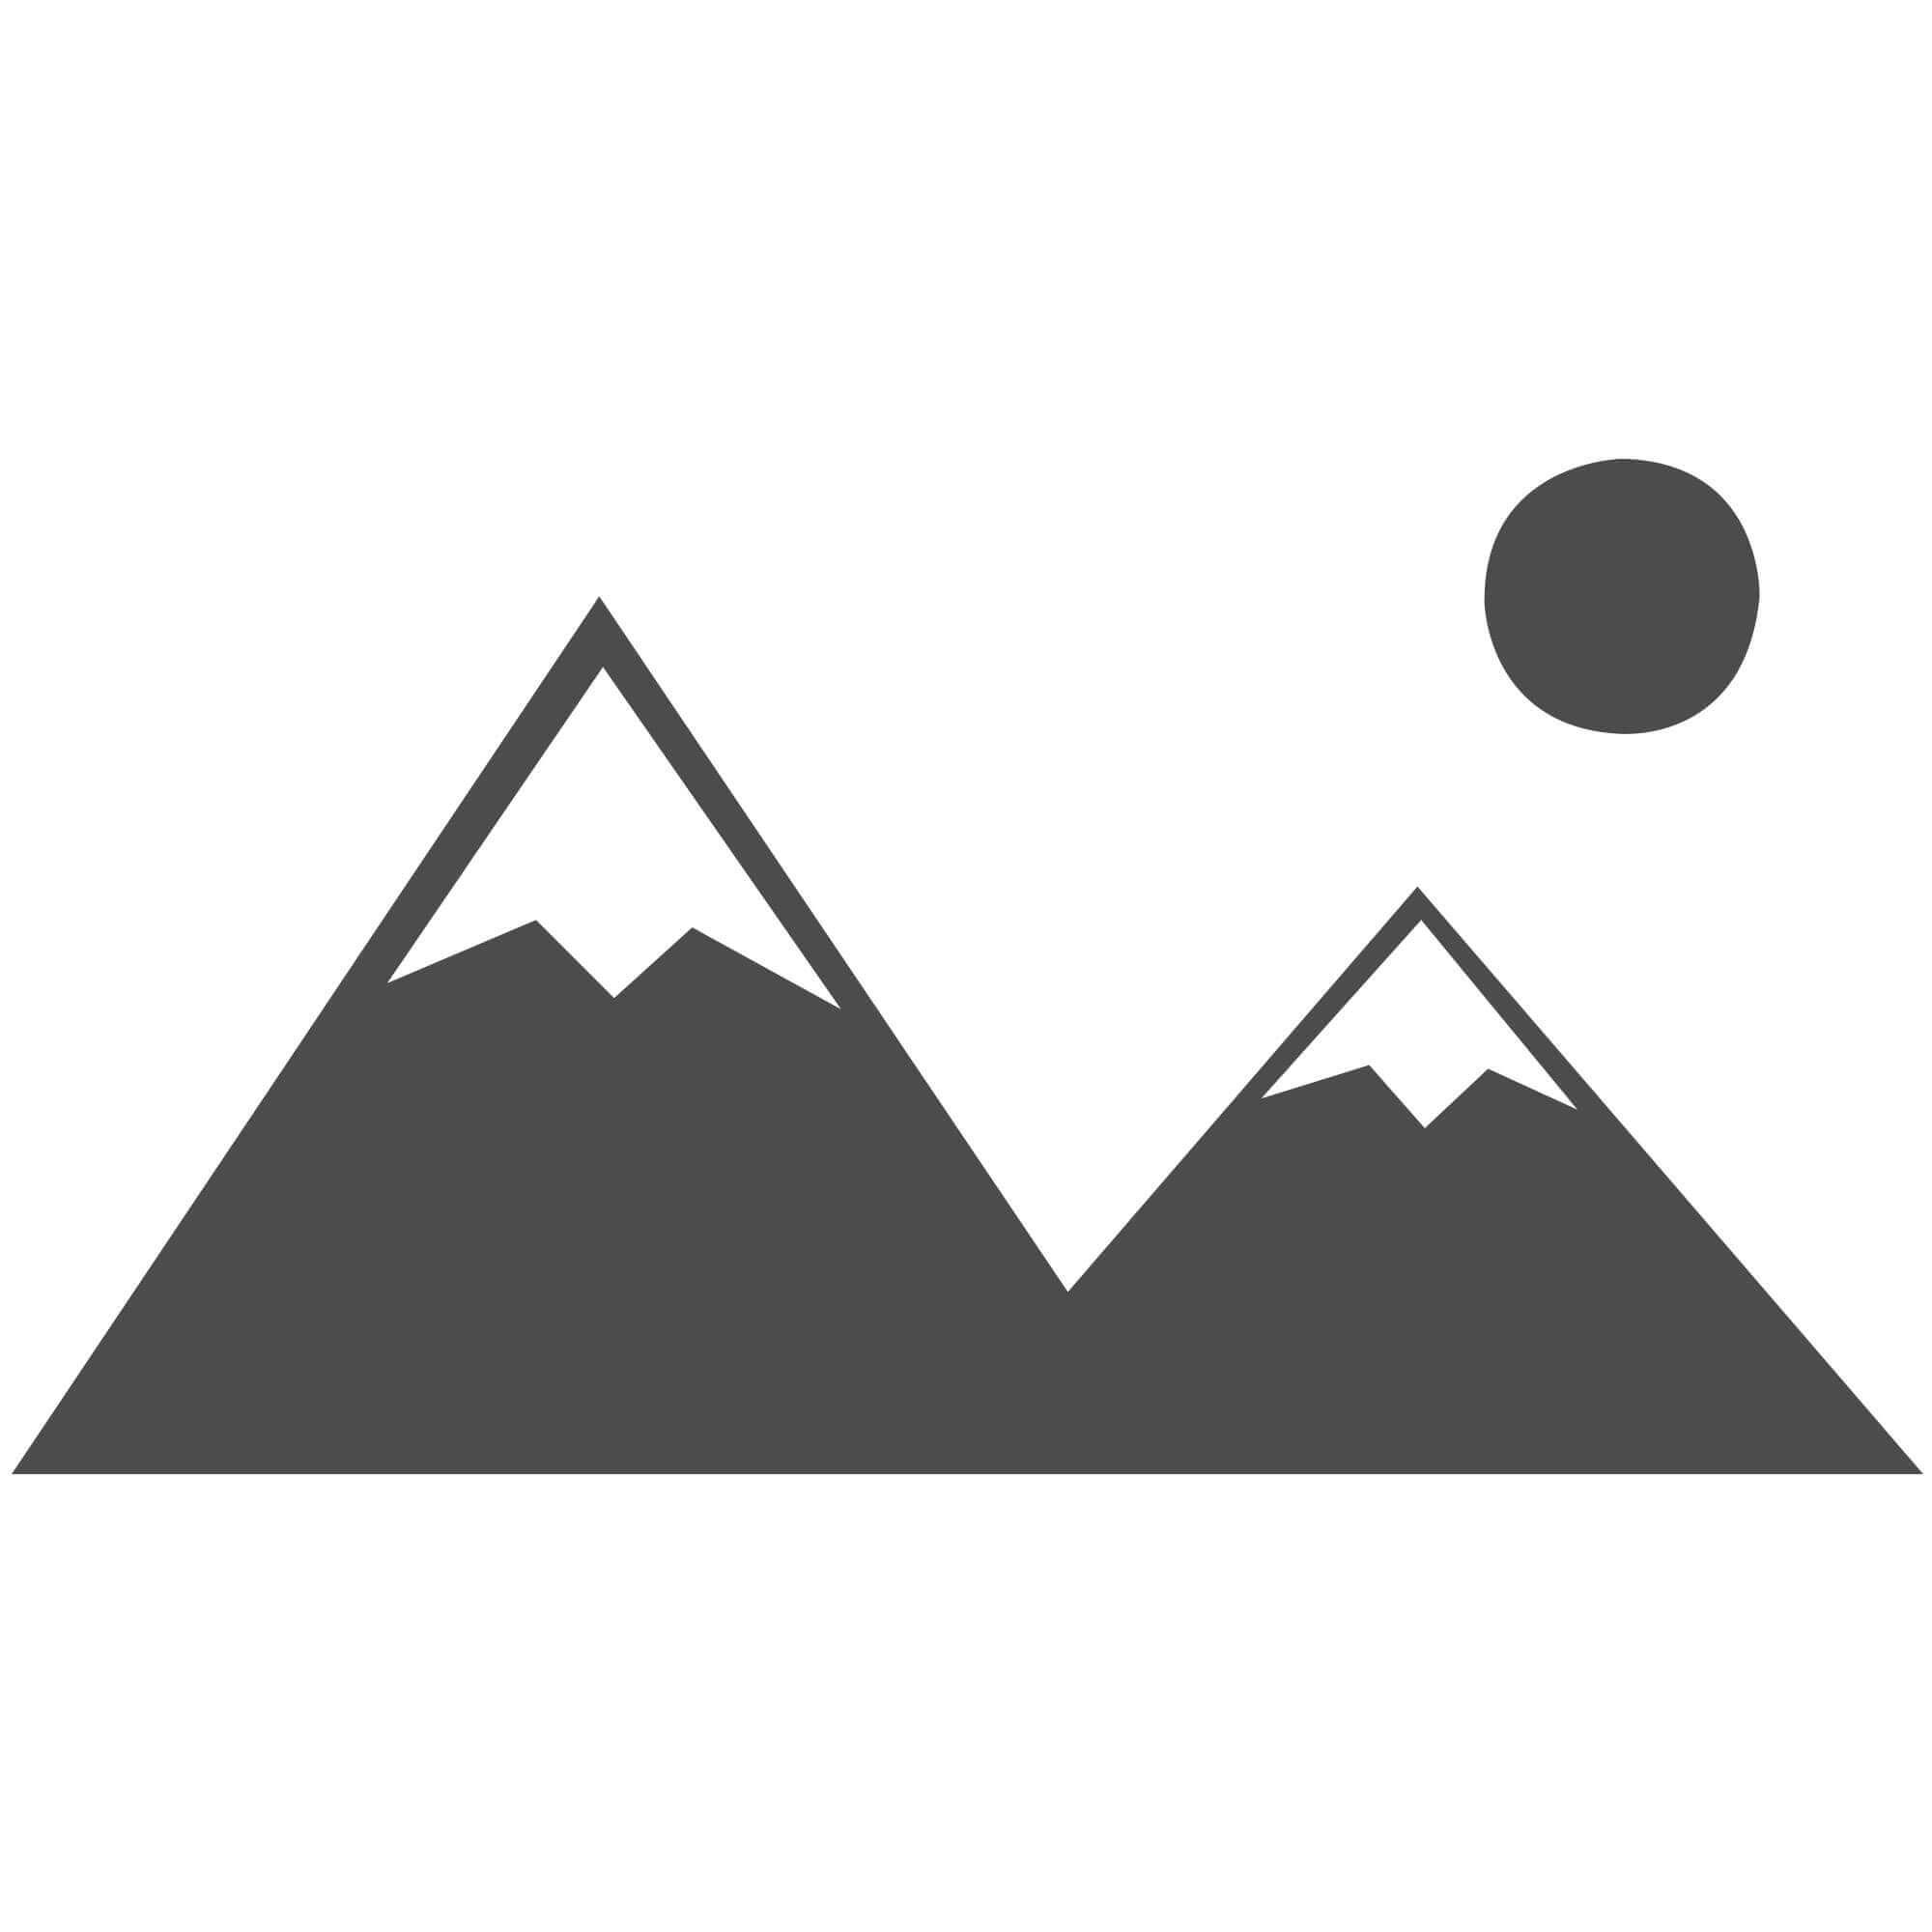 Dovre Astroline 3CB Wood Burning Stove with pedestal #FPW